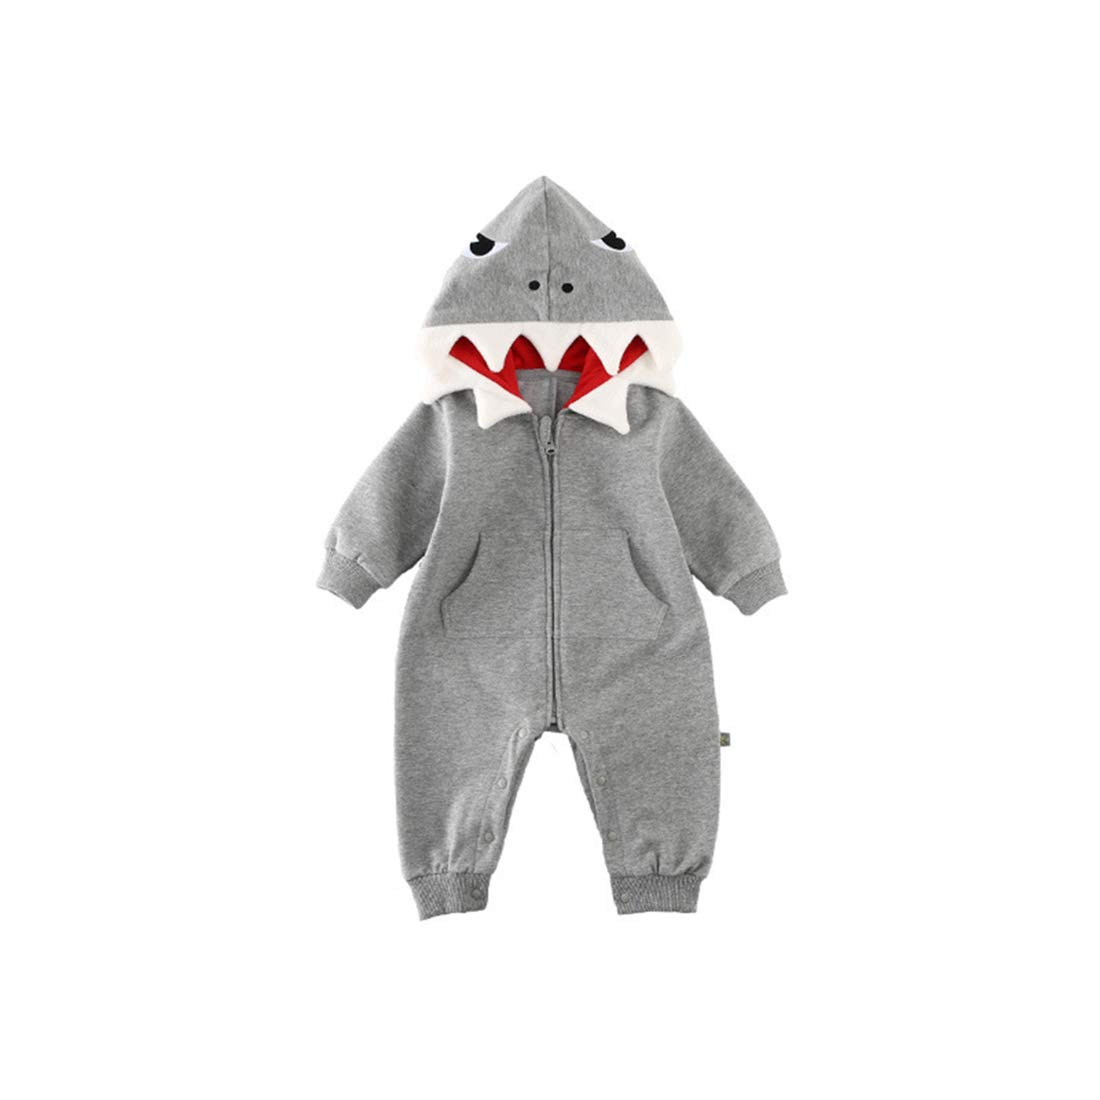 ALLAIBB Baby Shark Costumes San Diego Mall Onesie Cute 3D Genuine Free Shipping Romper Cotton Cartoon